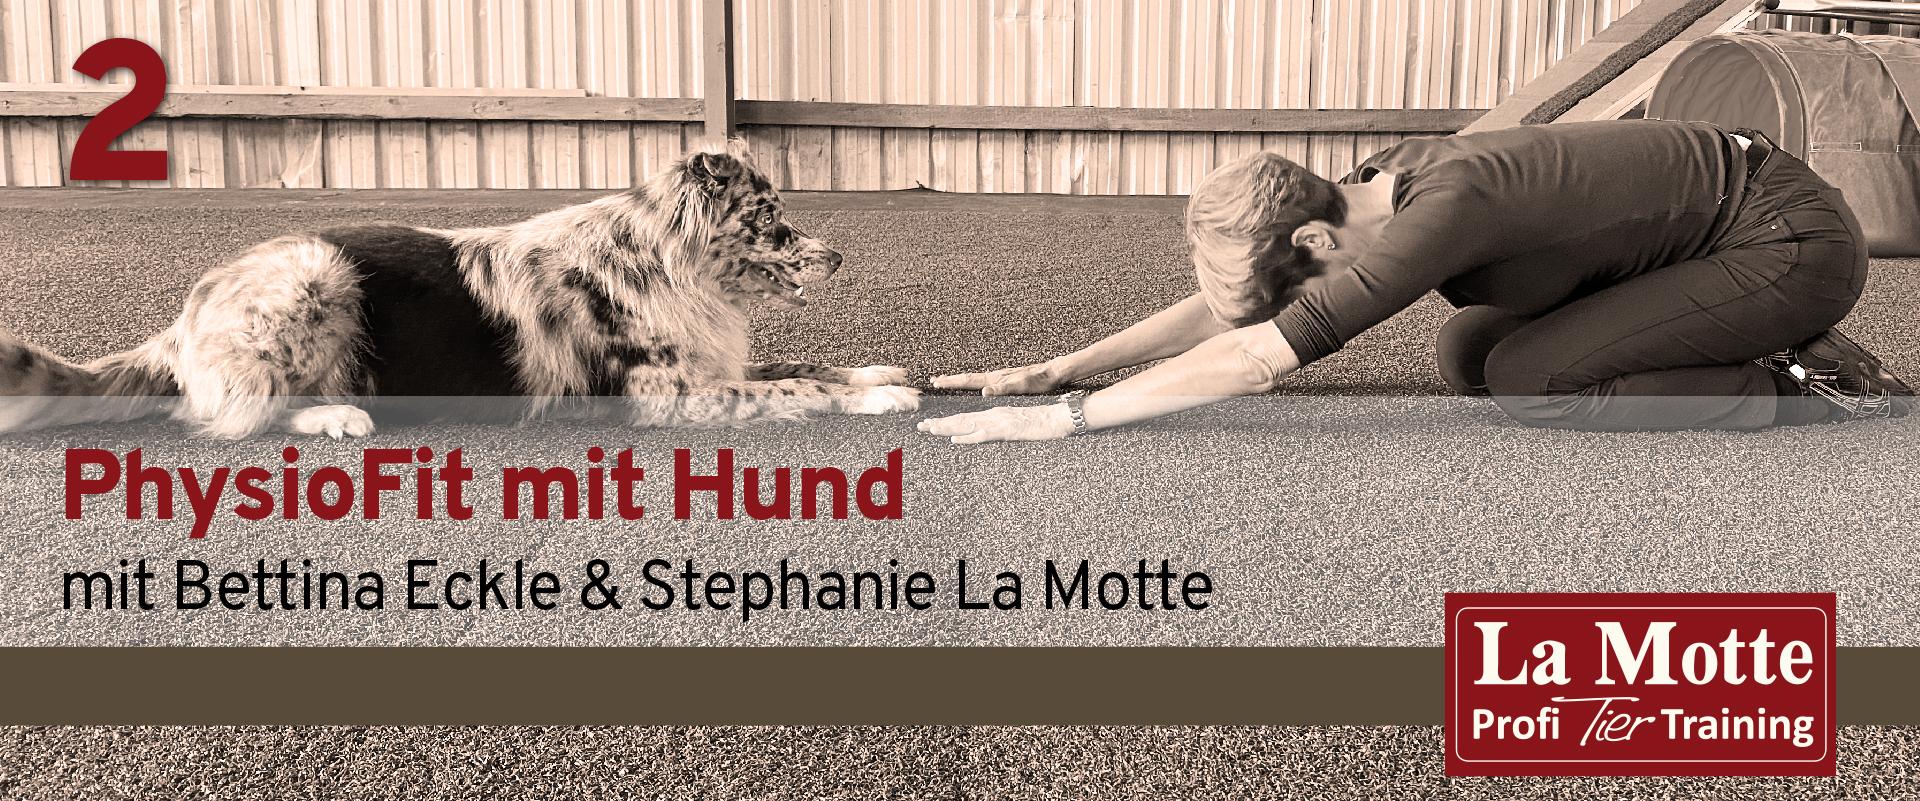 PhysioFit mit Hund mit Bettina Ecke & Stephanie La Motte - Teil 2